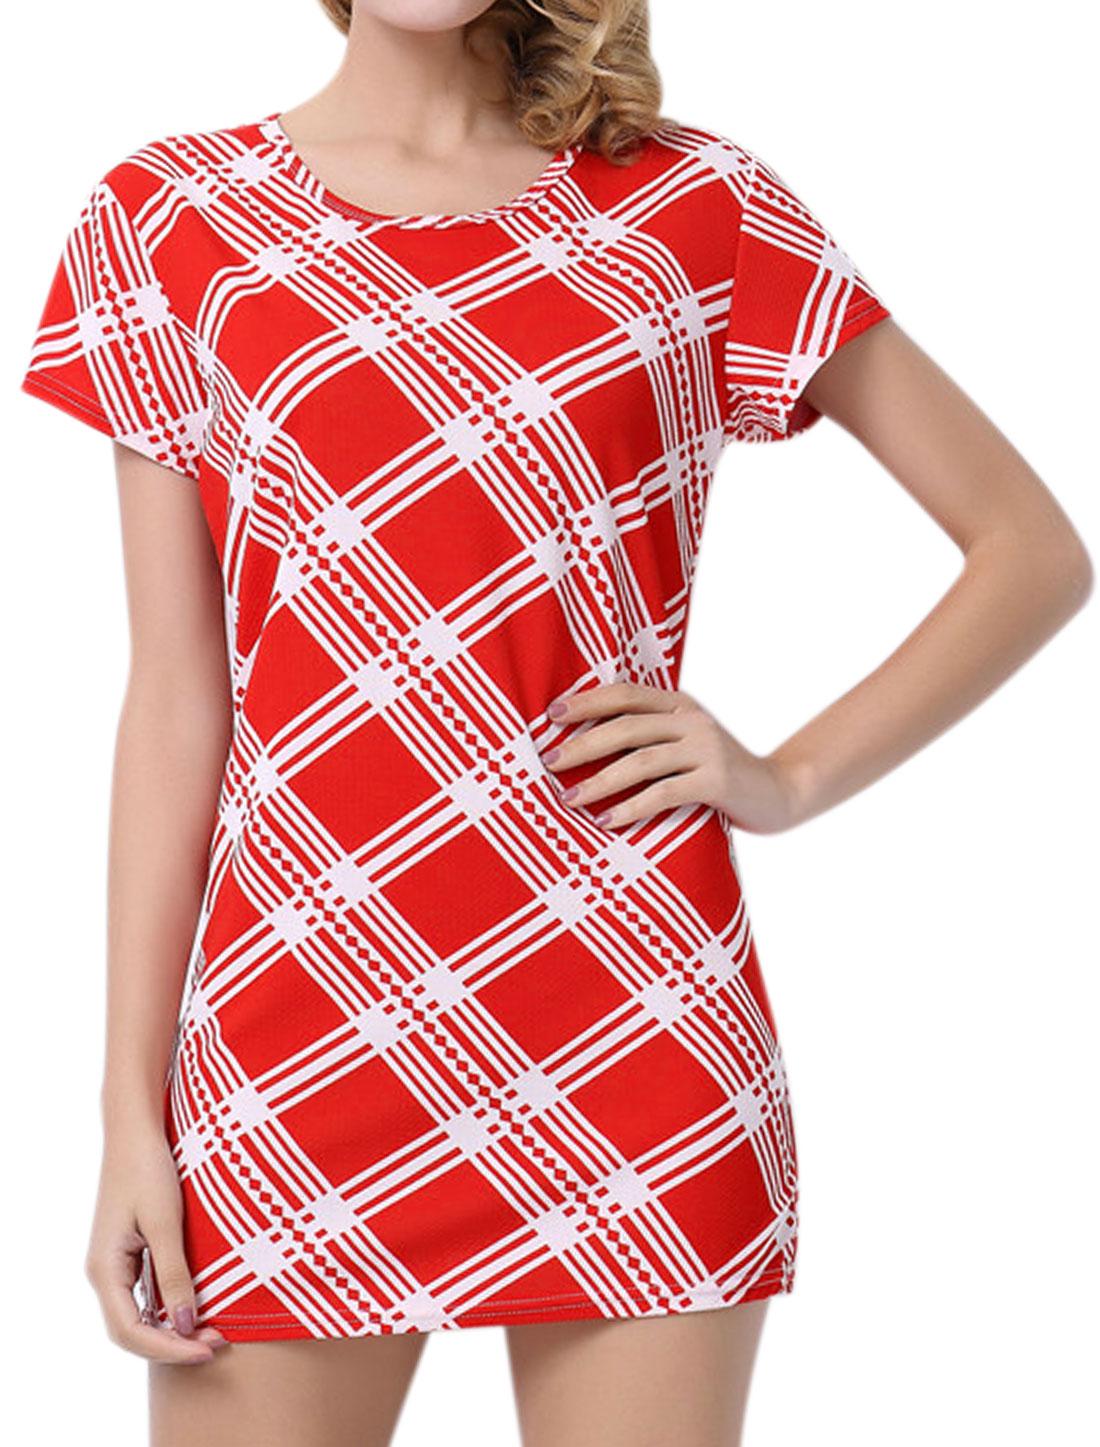 Women Short Sleeves Round Neck Checks Stripes Sheath Dress Red M